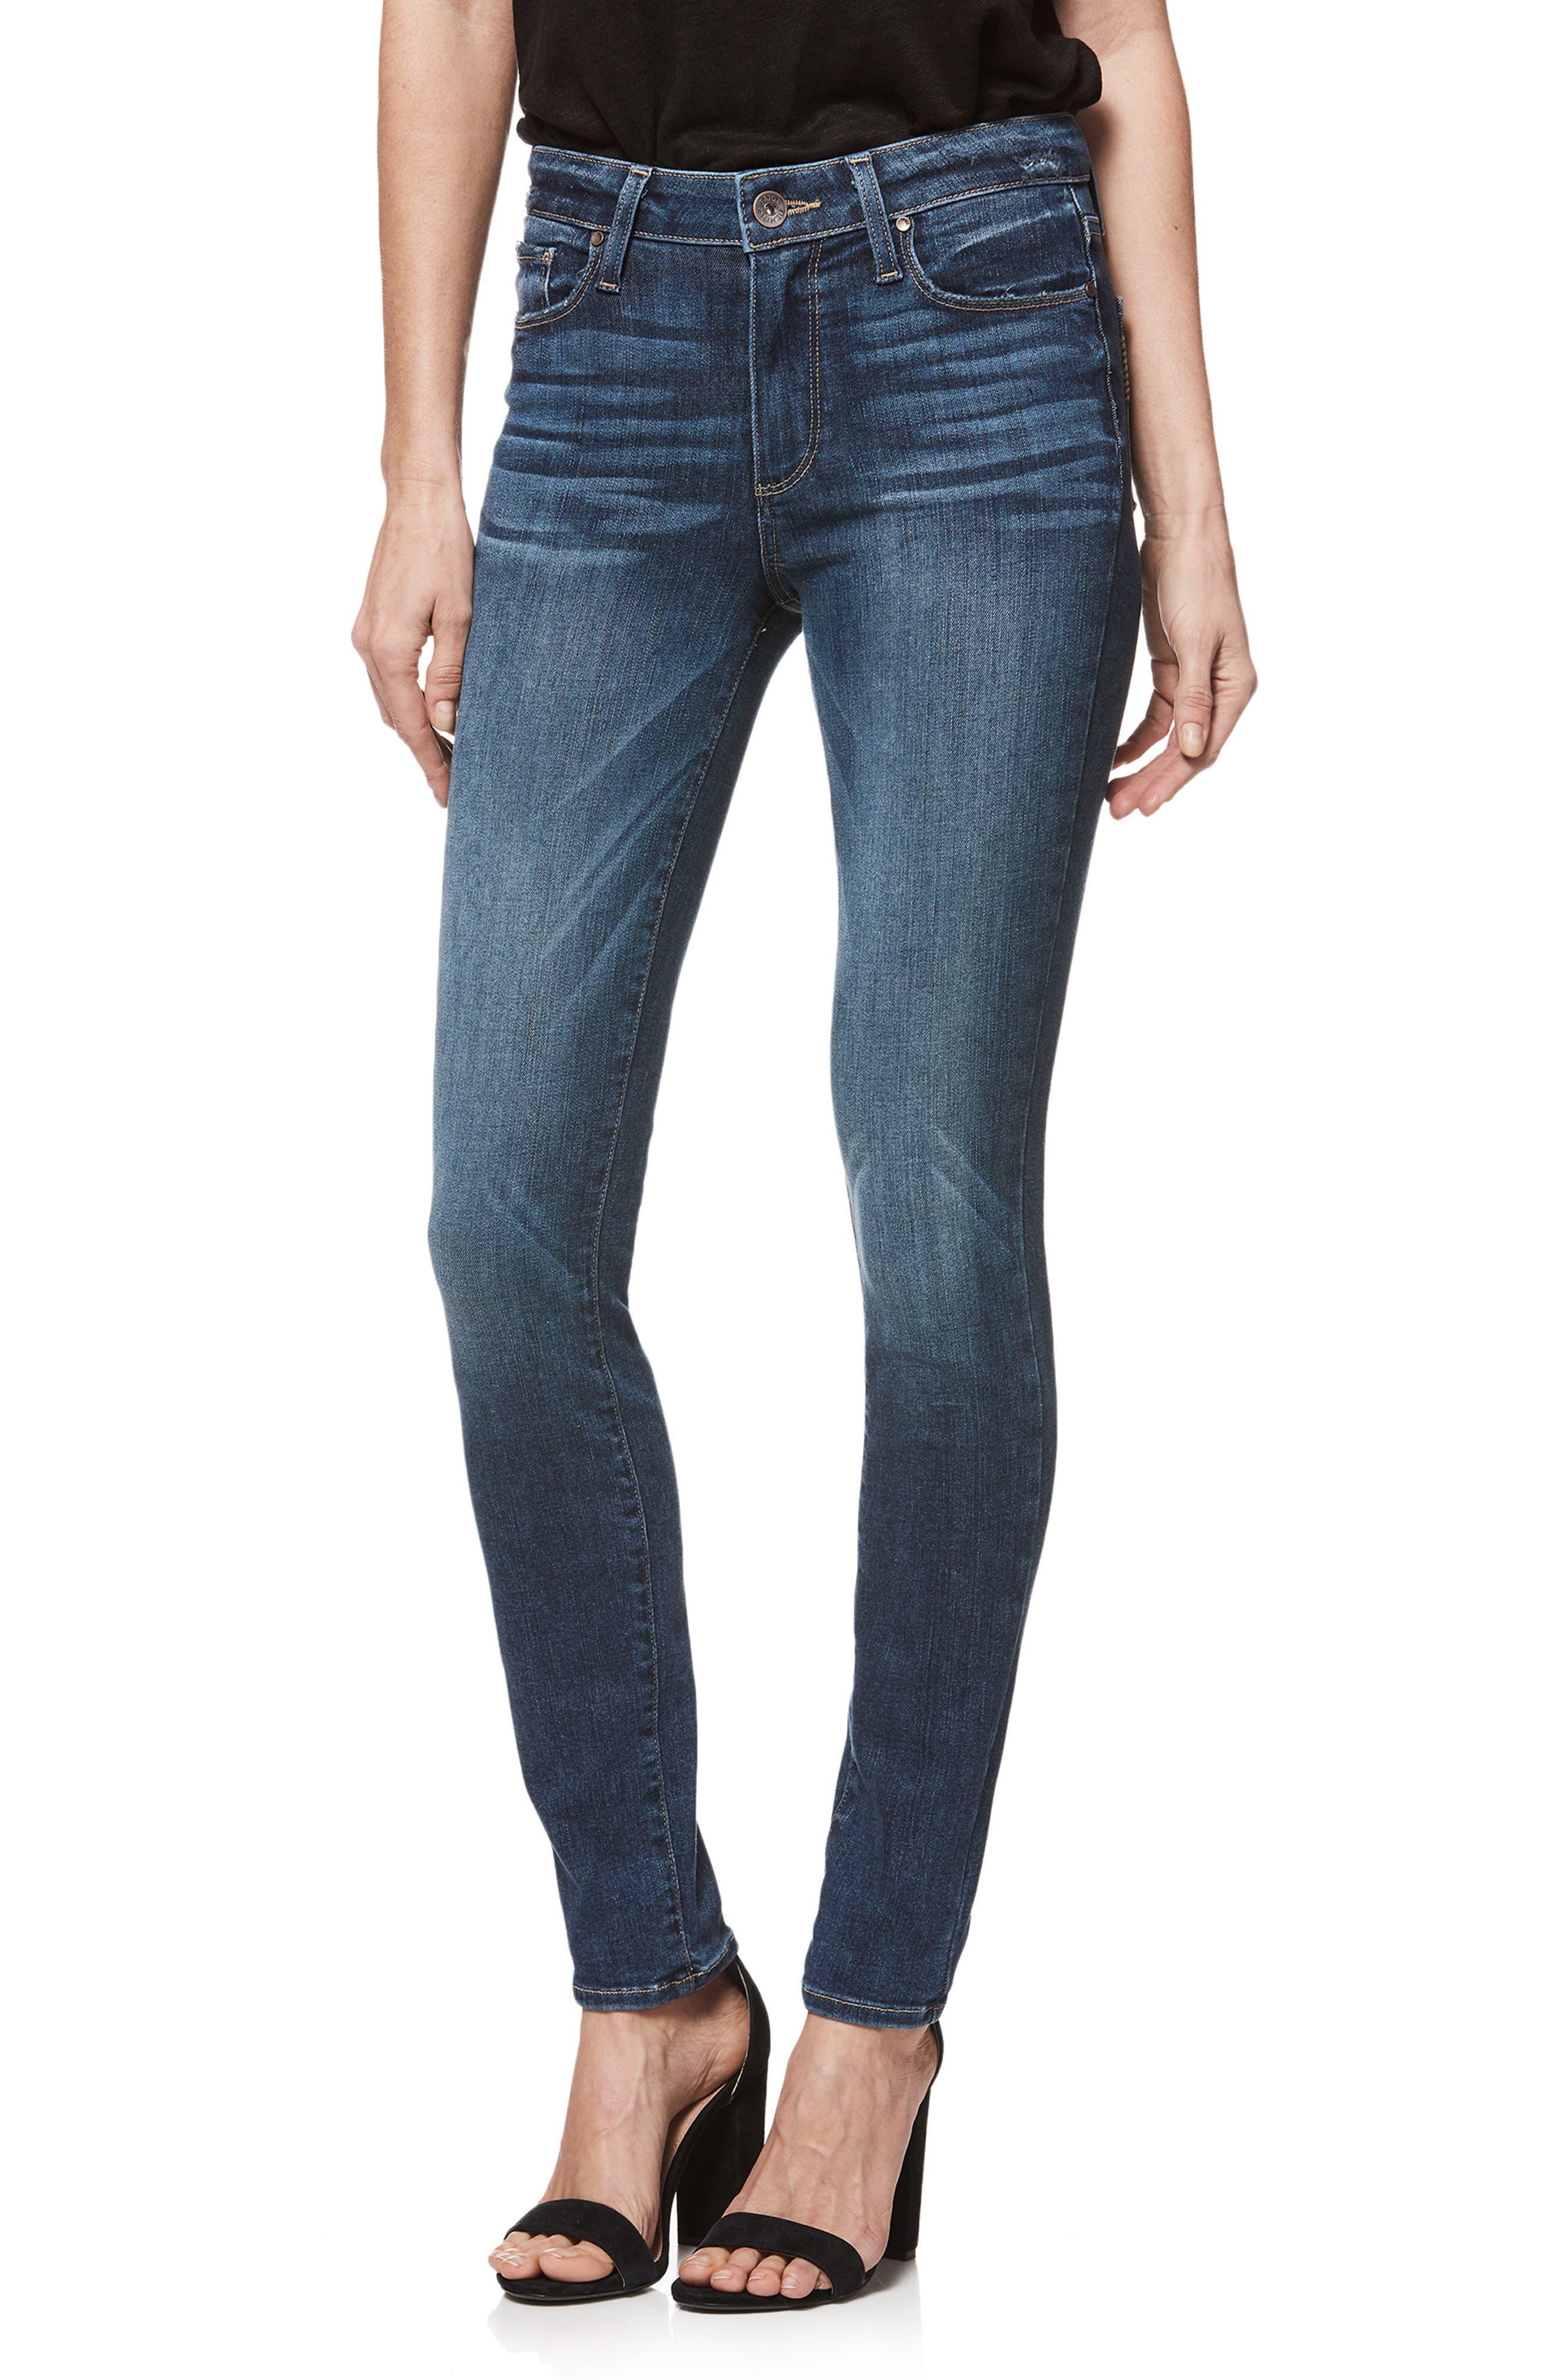 Transcend Vintage - Hoxton High Waist Ultra Skinny Jeans,                             Main thumbnail 1, color,                             400